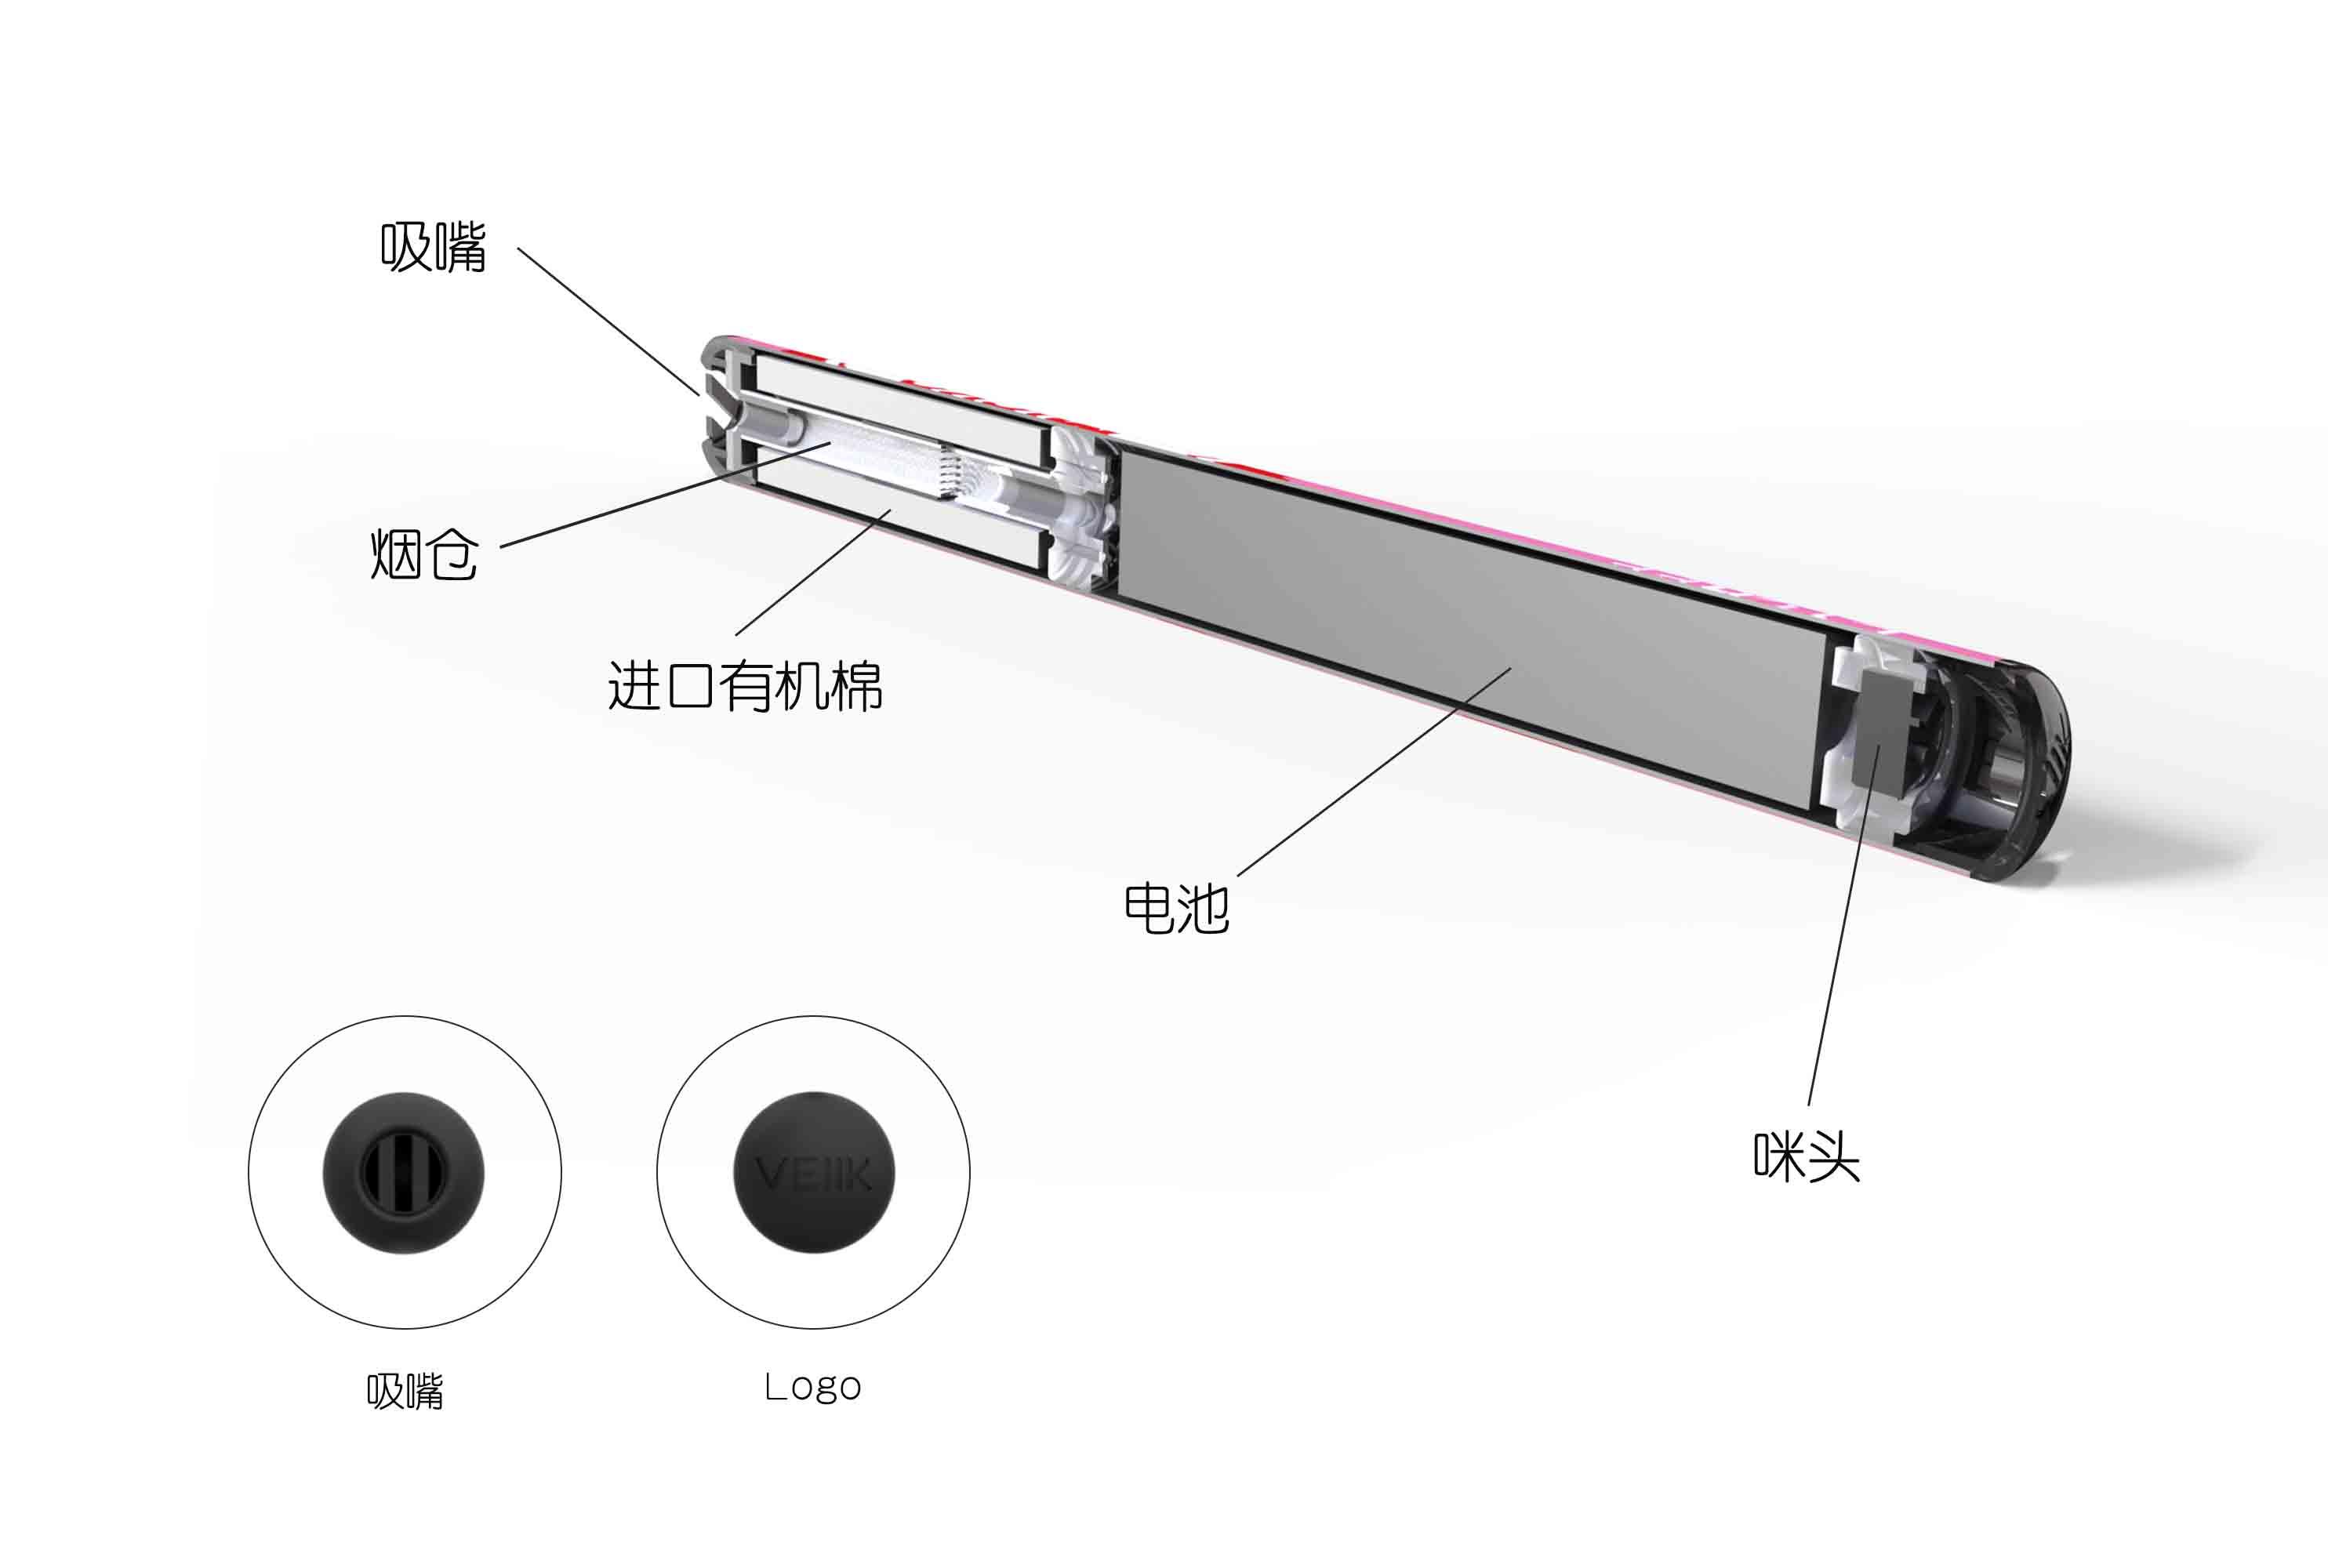 micko小烟中文版详情-3-结构图